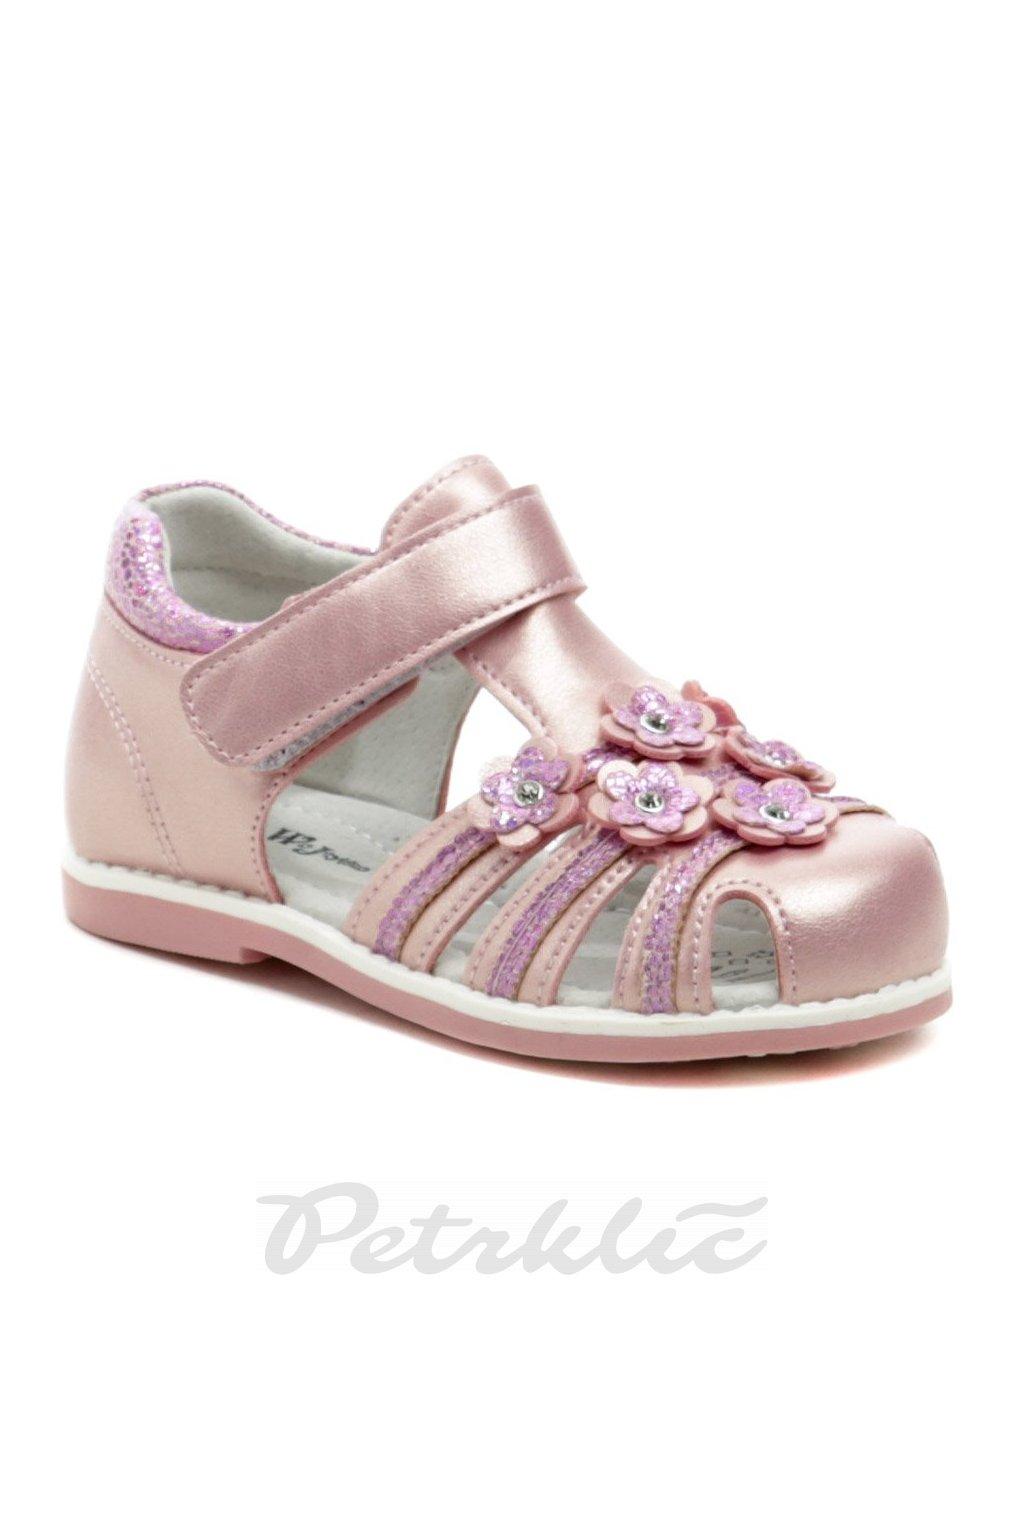 Wojtylko 2S41021 růžové sandálky